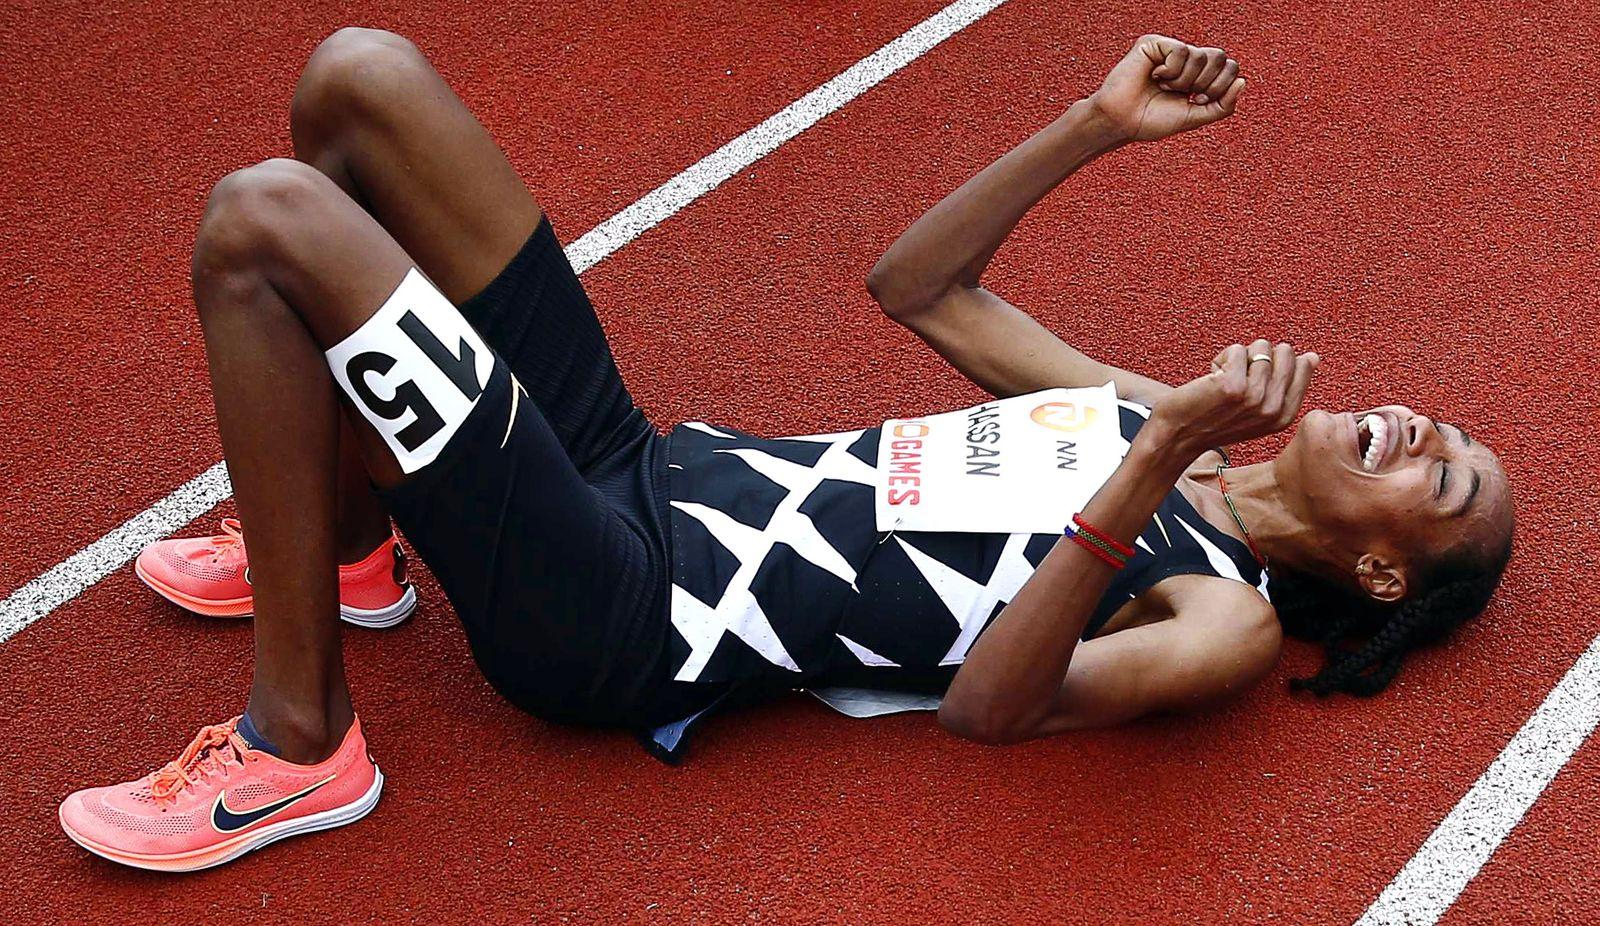 FBK Games athletics event in Hengelo